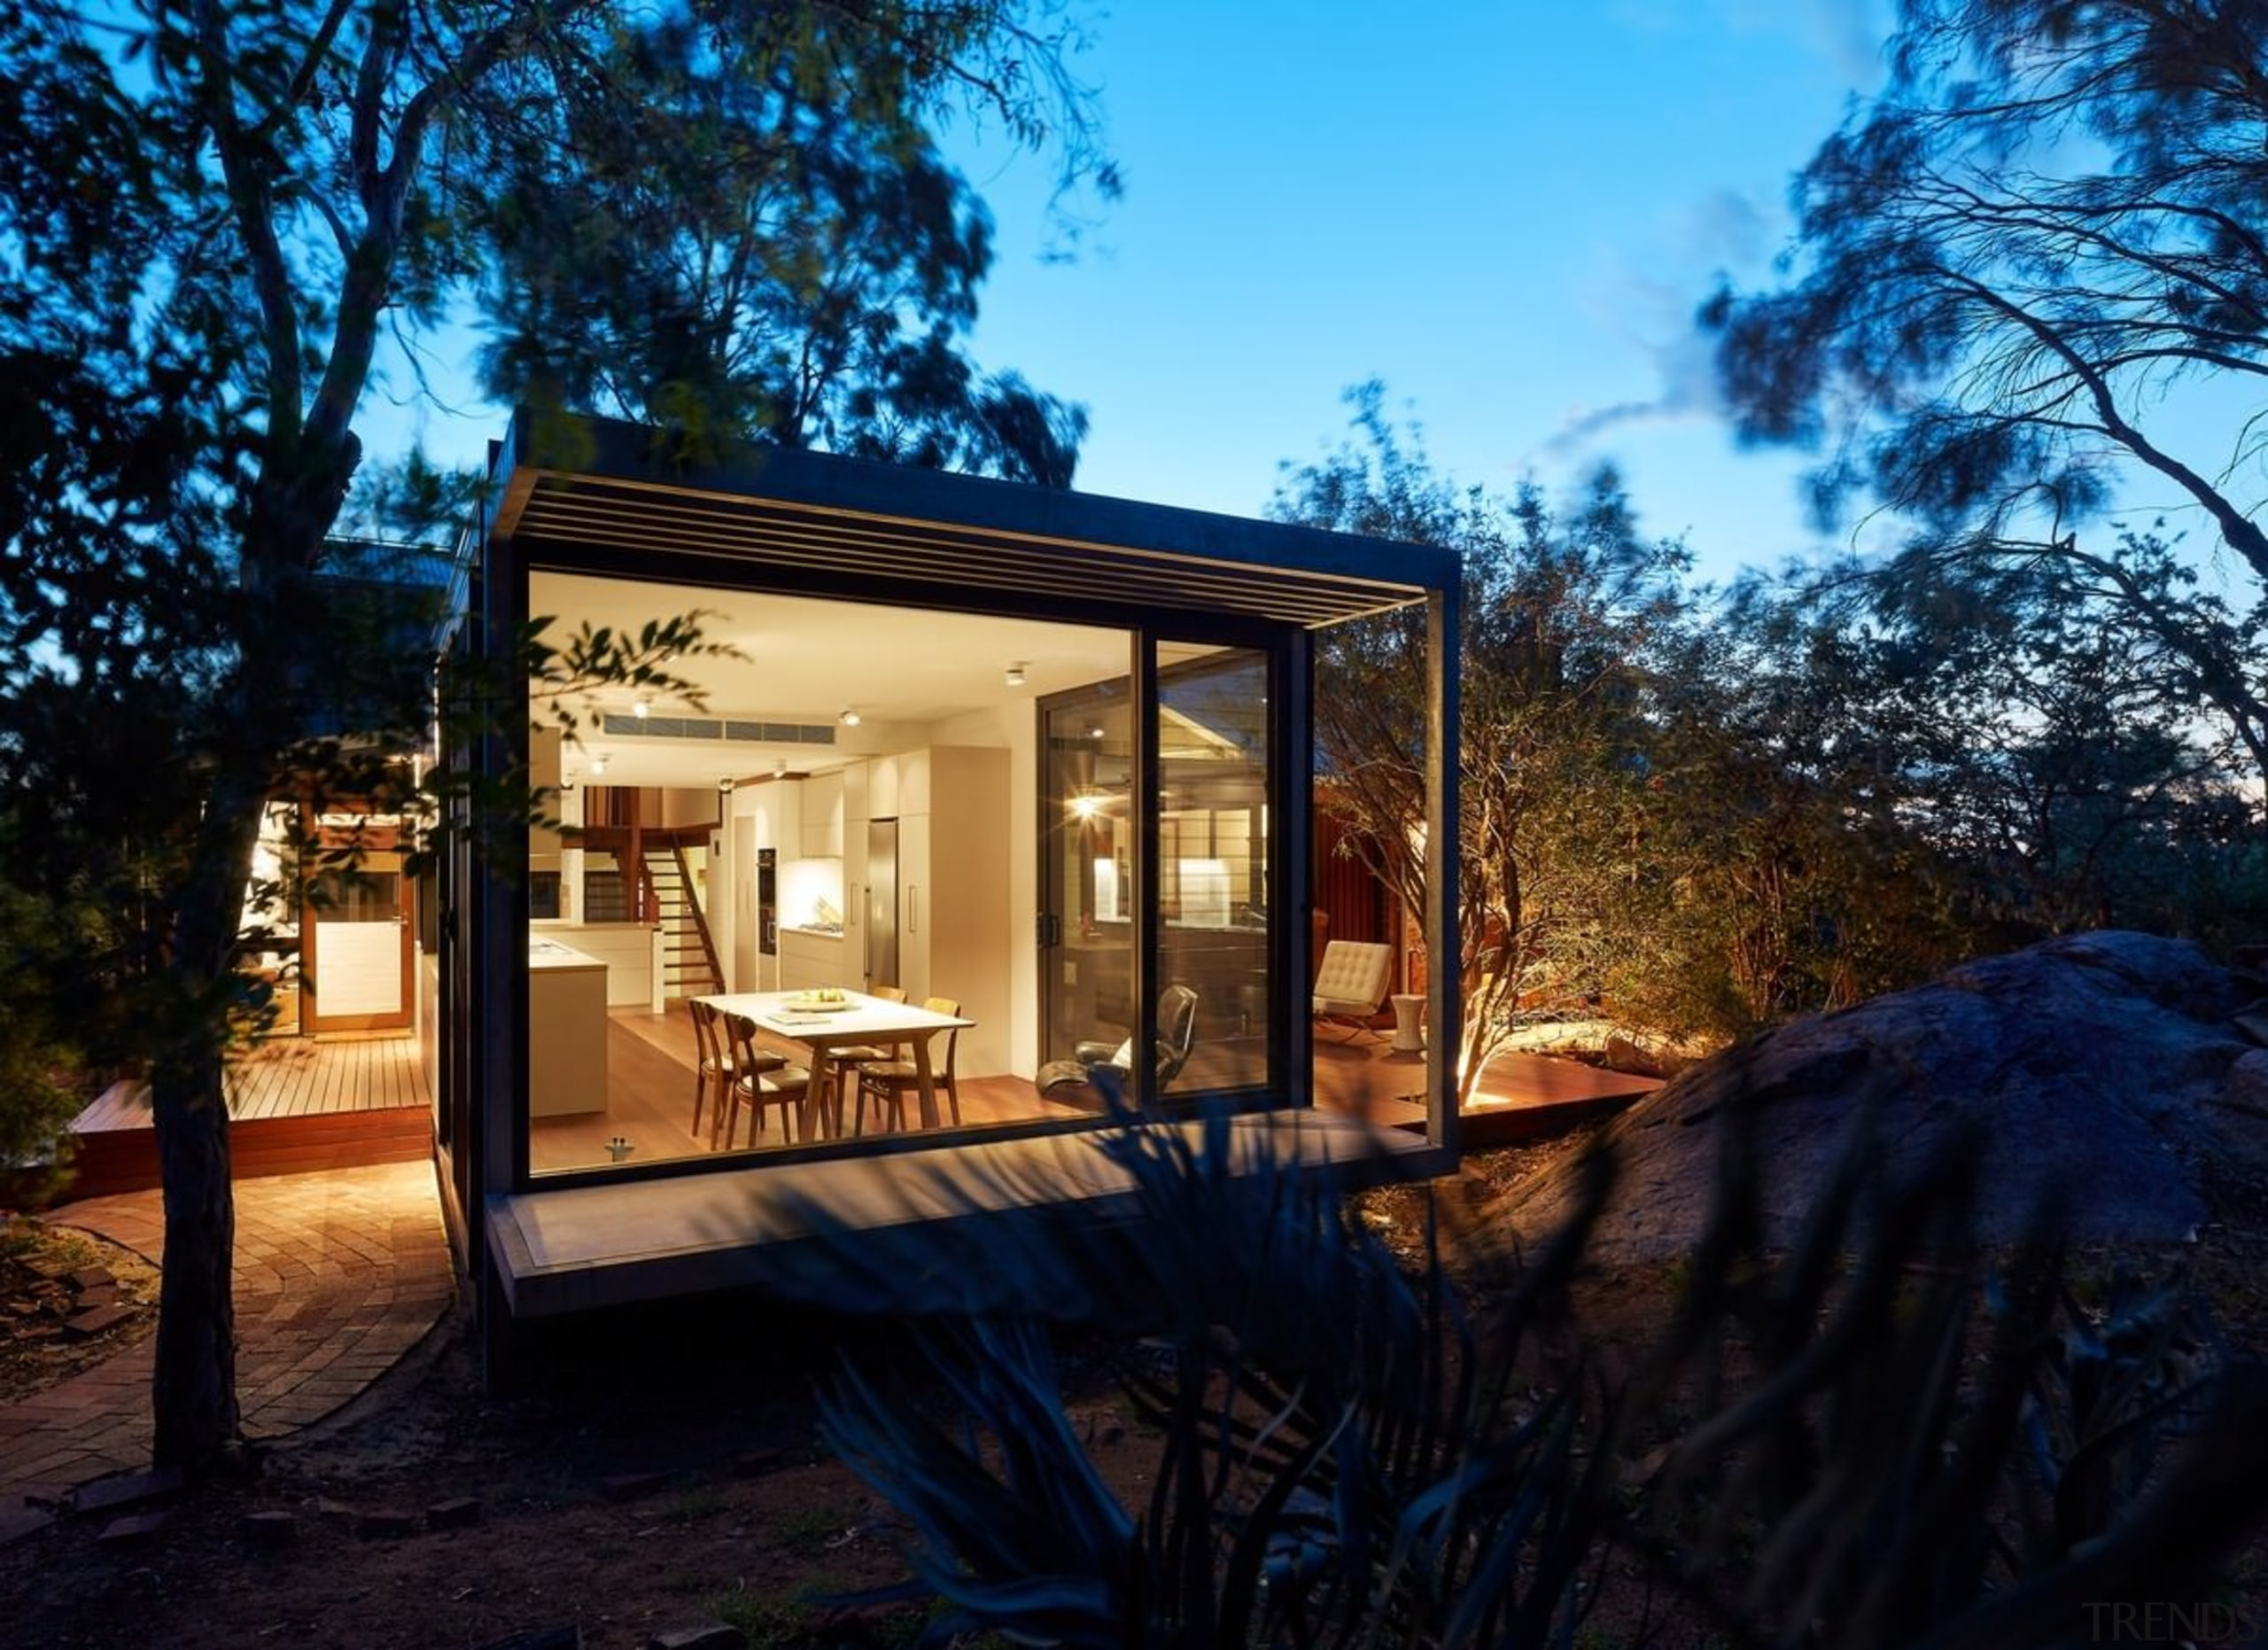 Life on MAARS - Life on MAARS - architecture, backyard, cottage, estate, facade, home, house, landscape, lighting, property, real estate, siding, villa, black